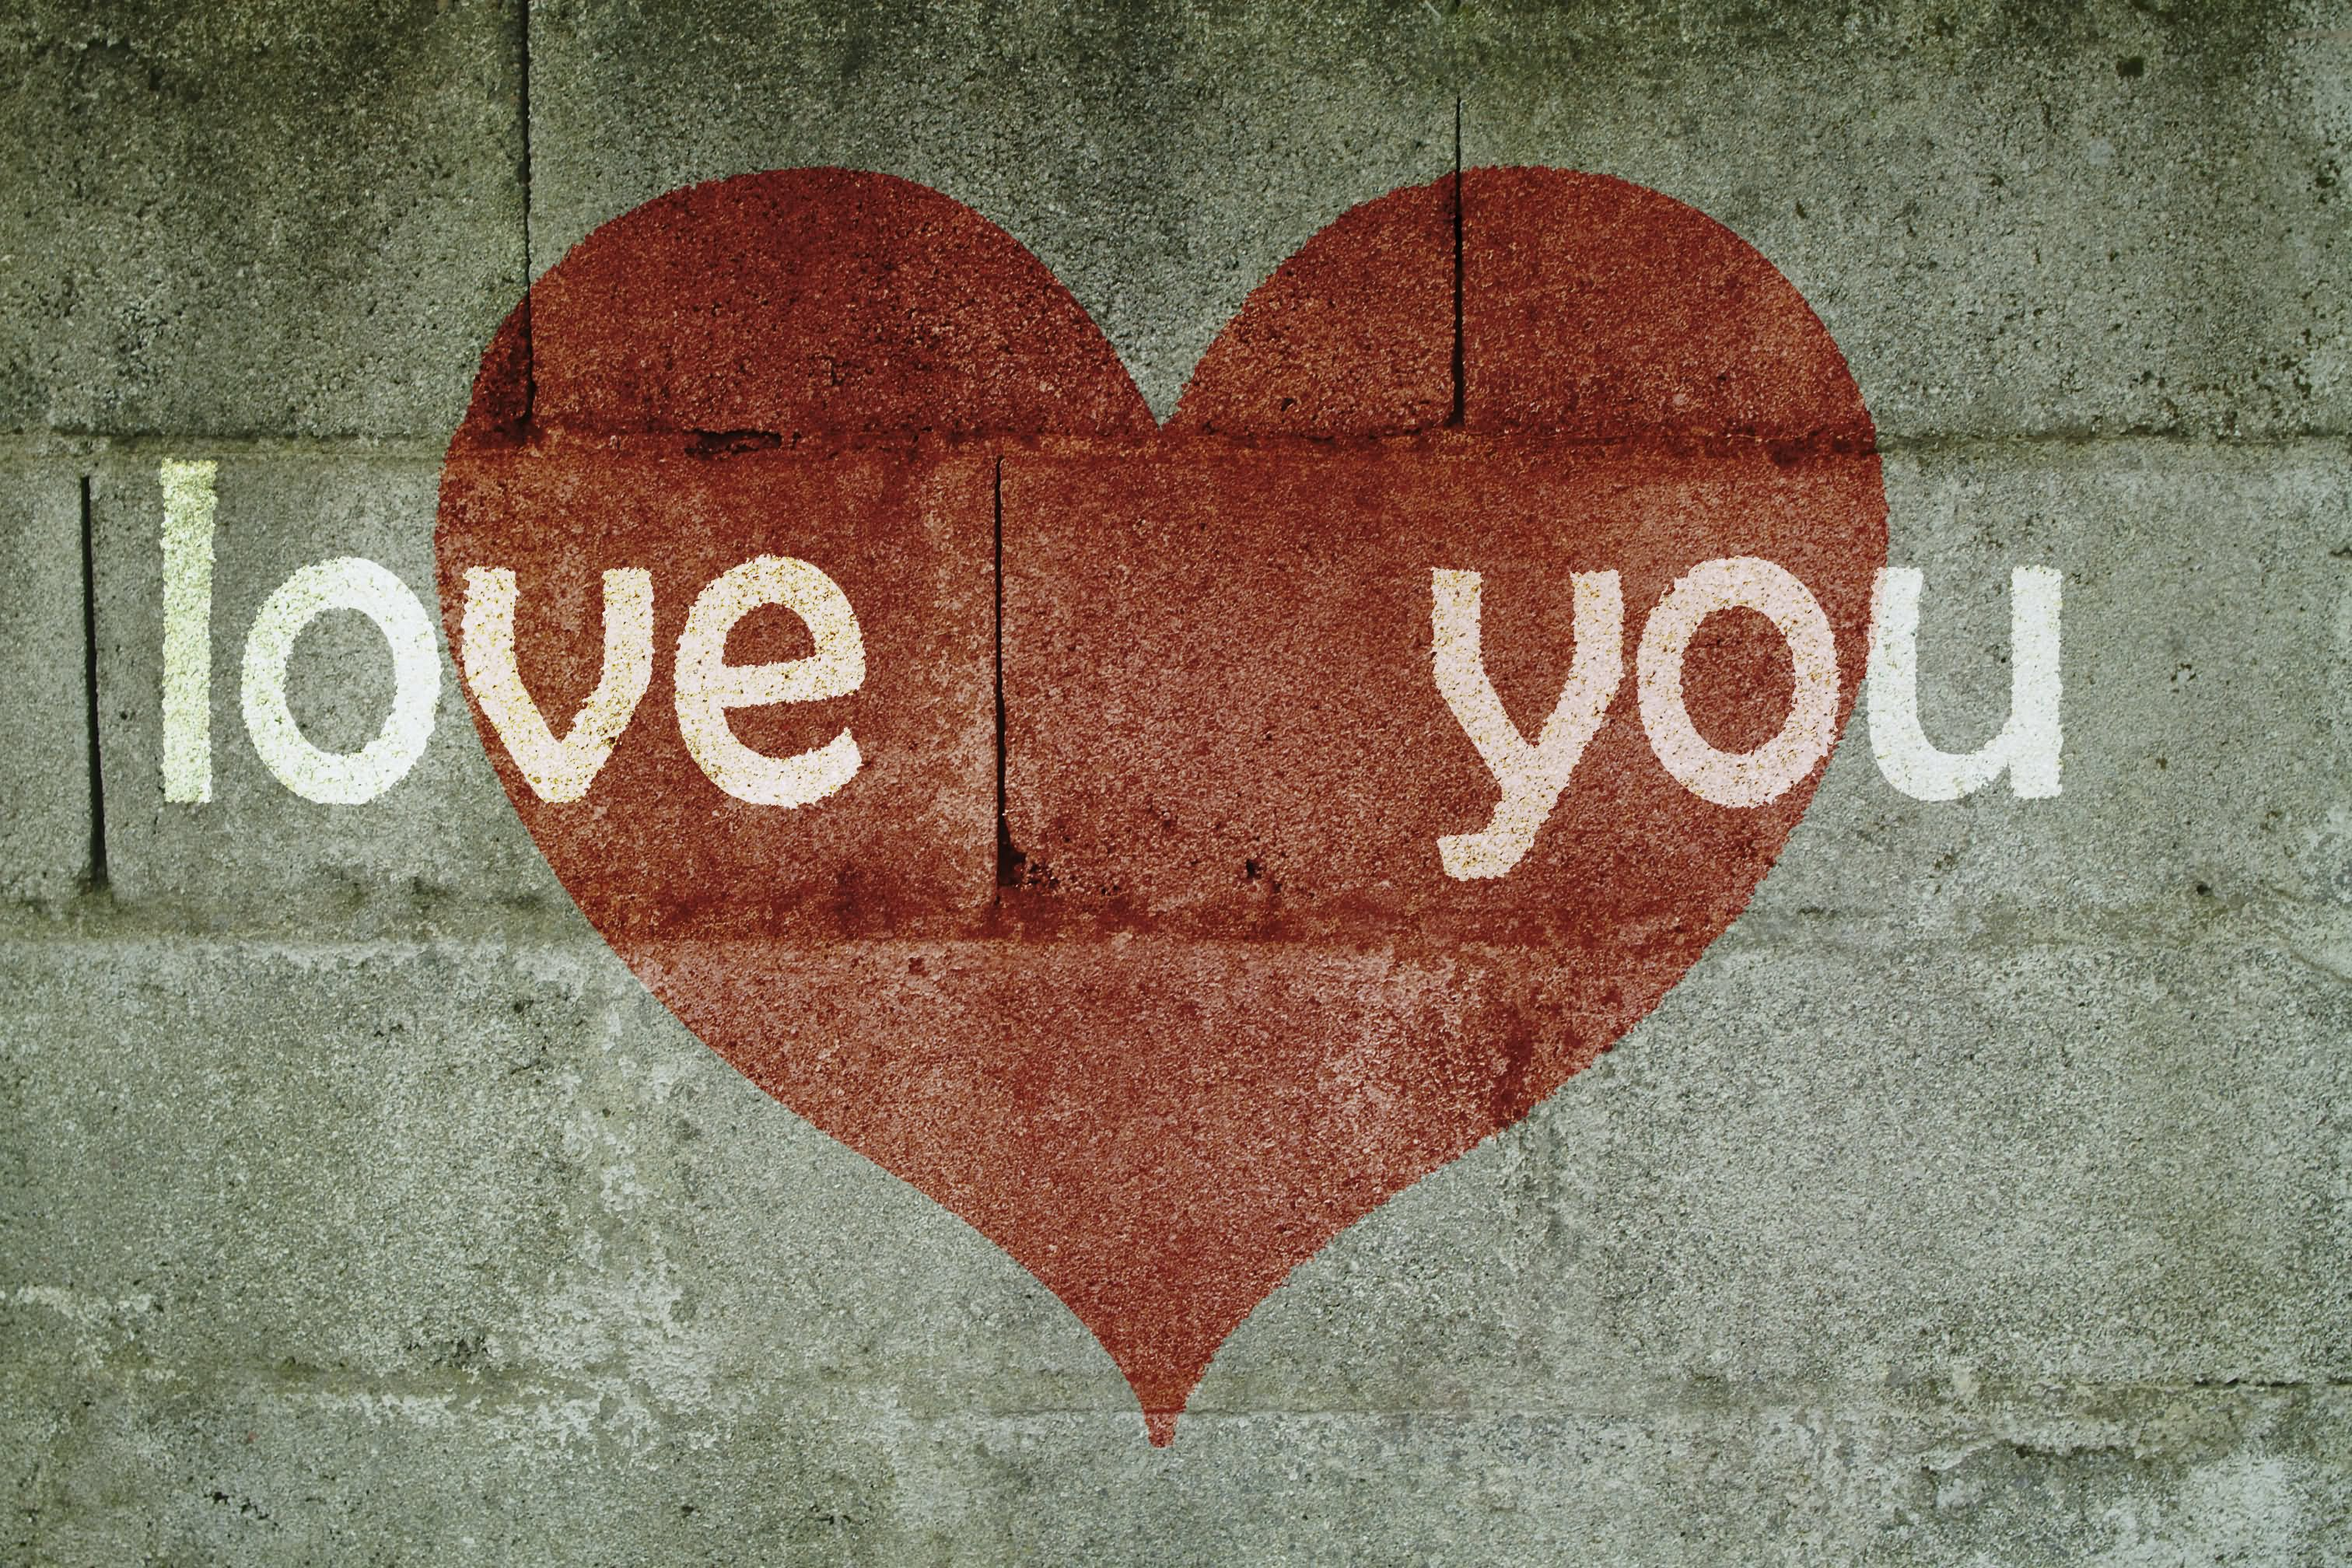 Hd wallpaper i love you - Love You On Wall Hd Wallpaper